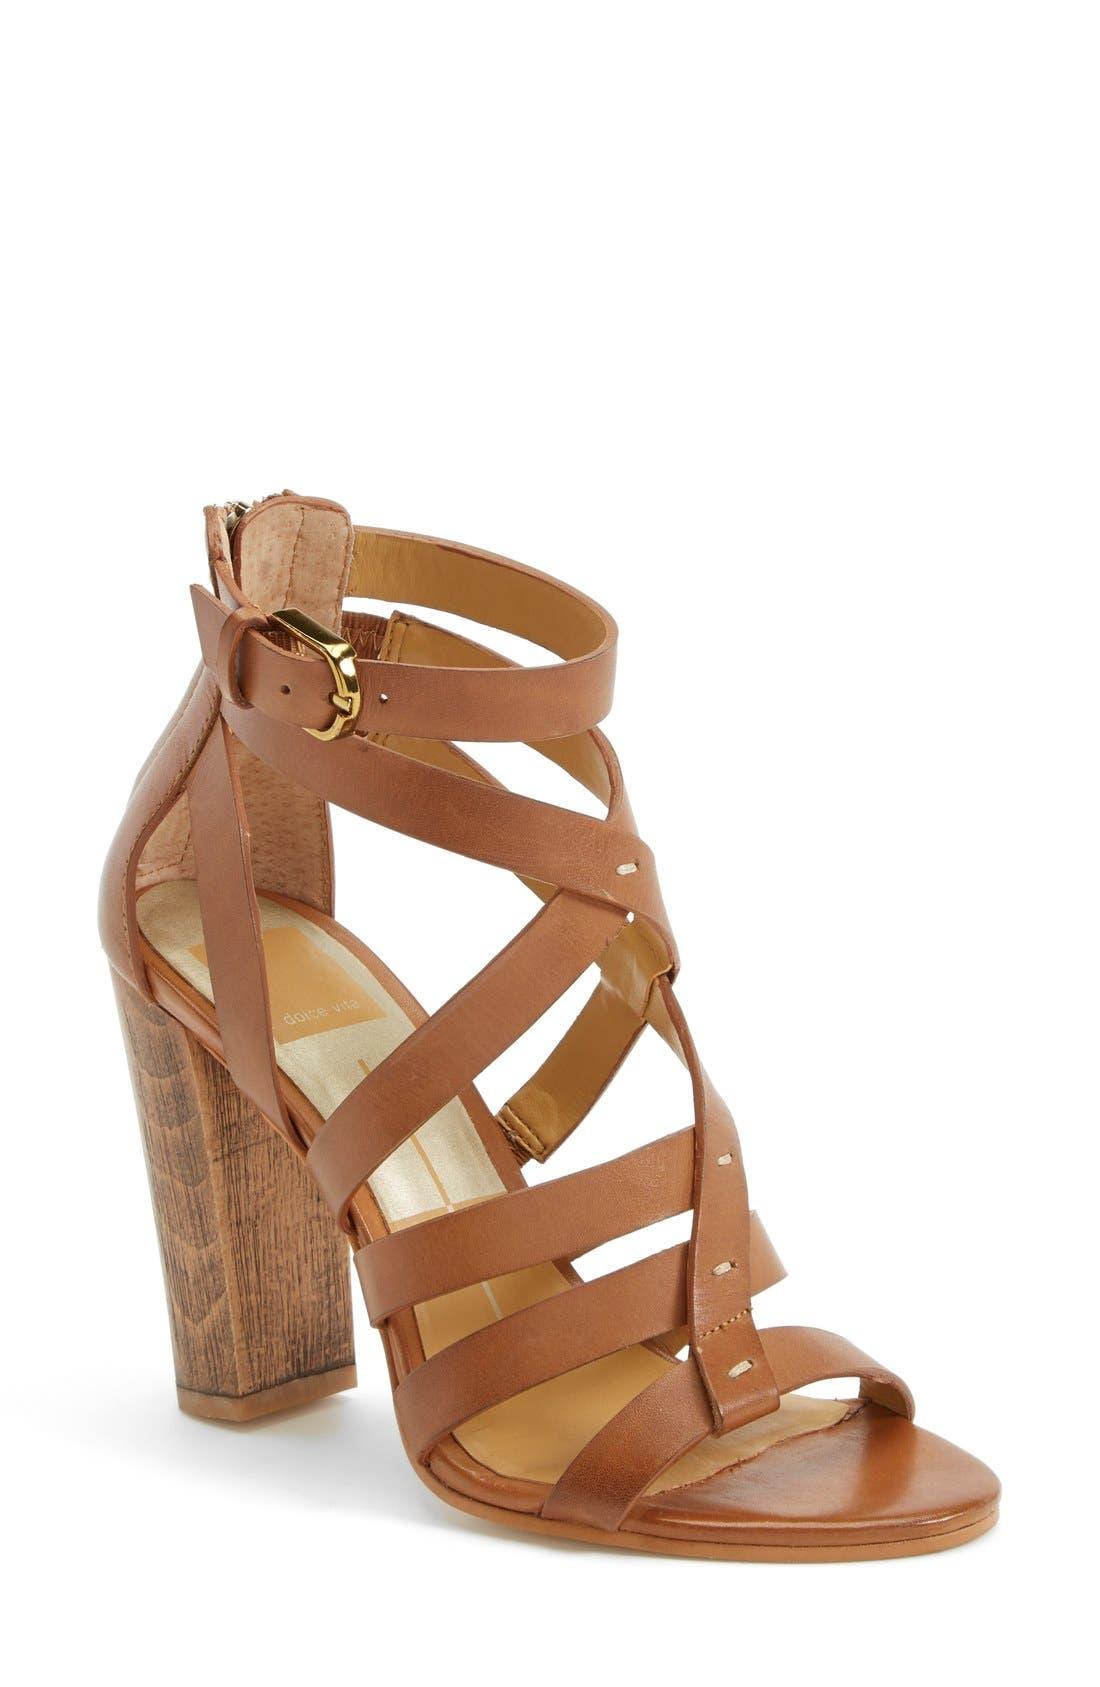 Main Image - Dolce Vita 'Nolin' Leather Sandal (Women)